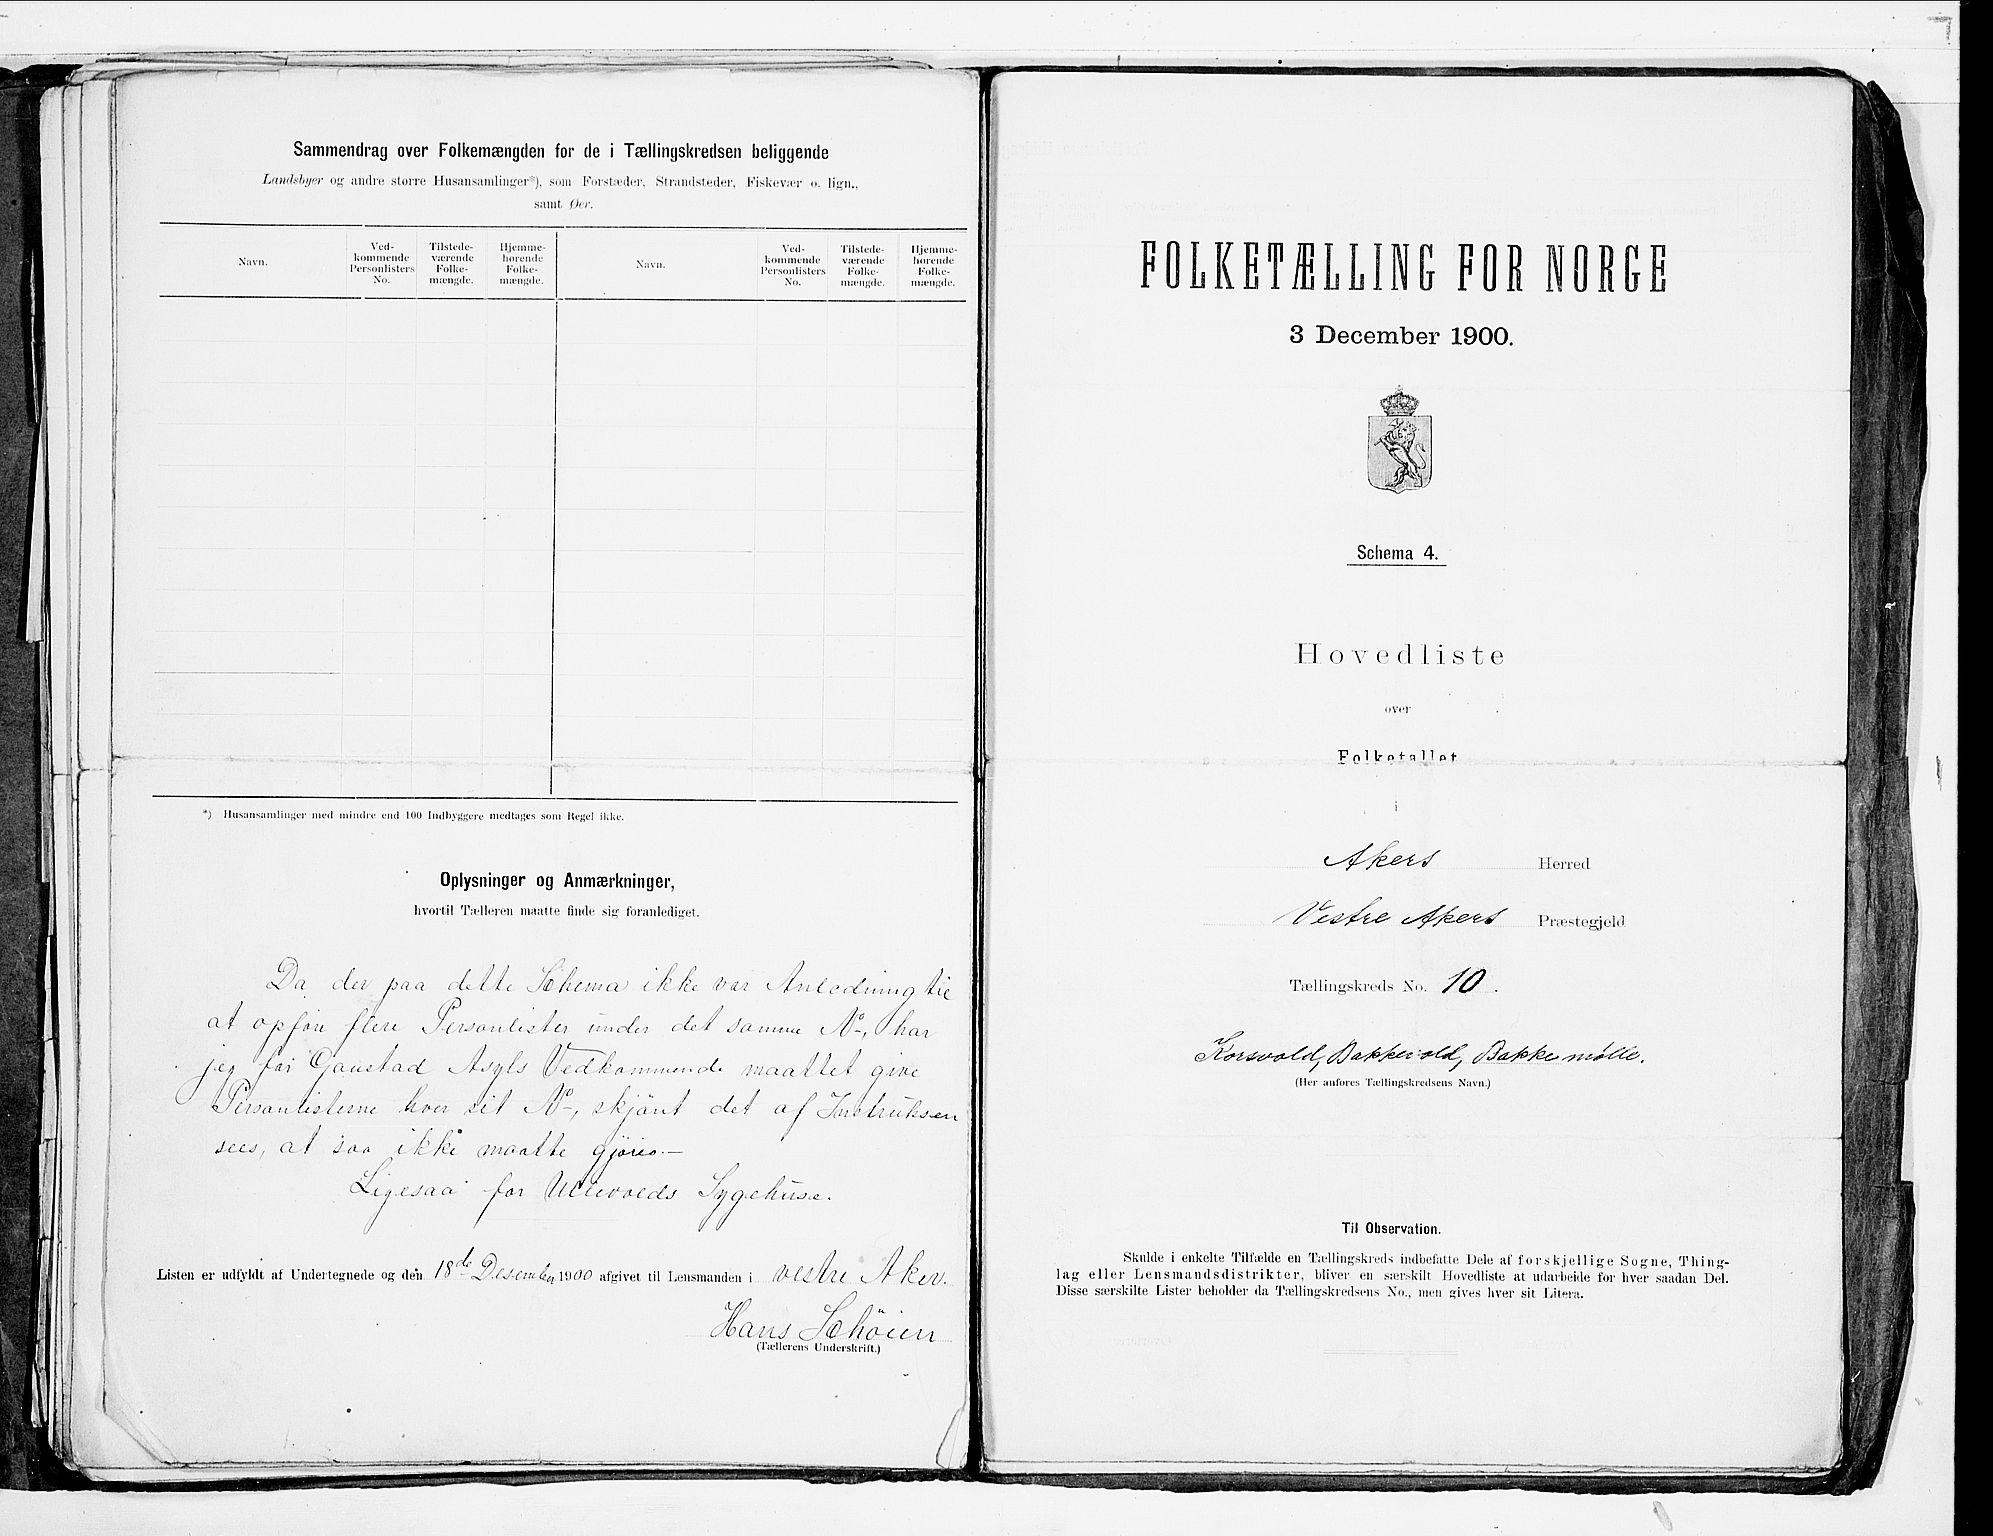 SAO, 1900 census for Aker, 1900, p. 64